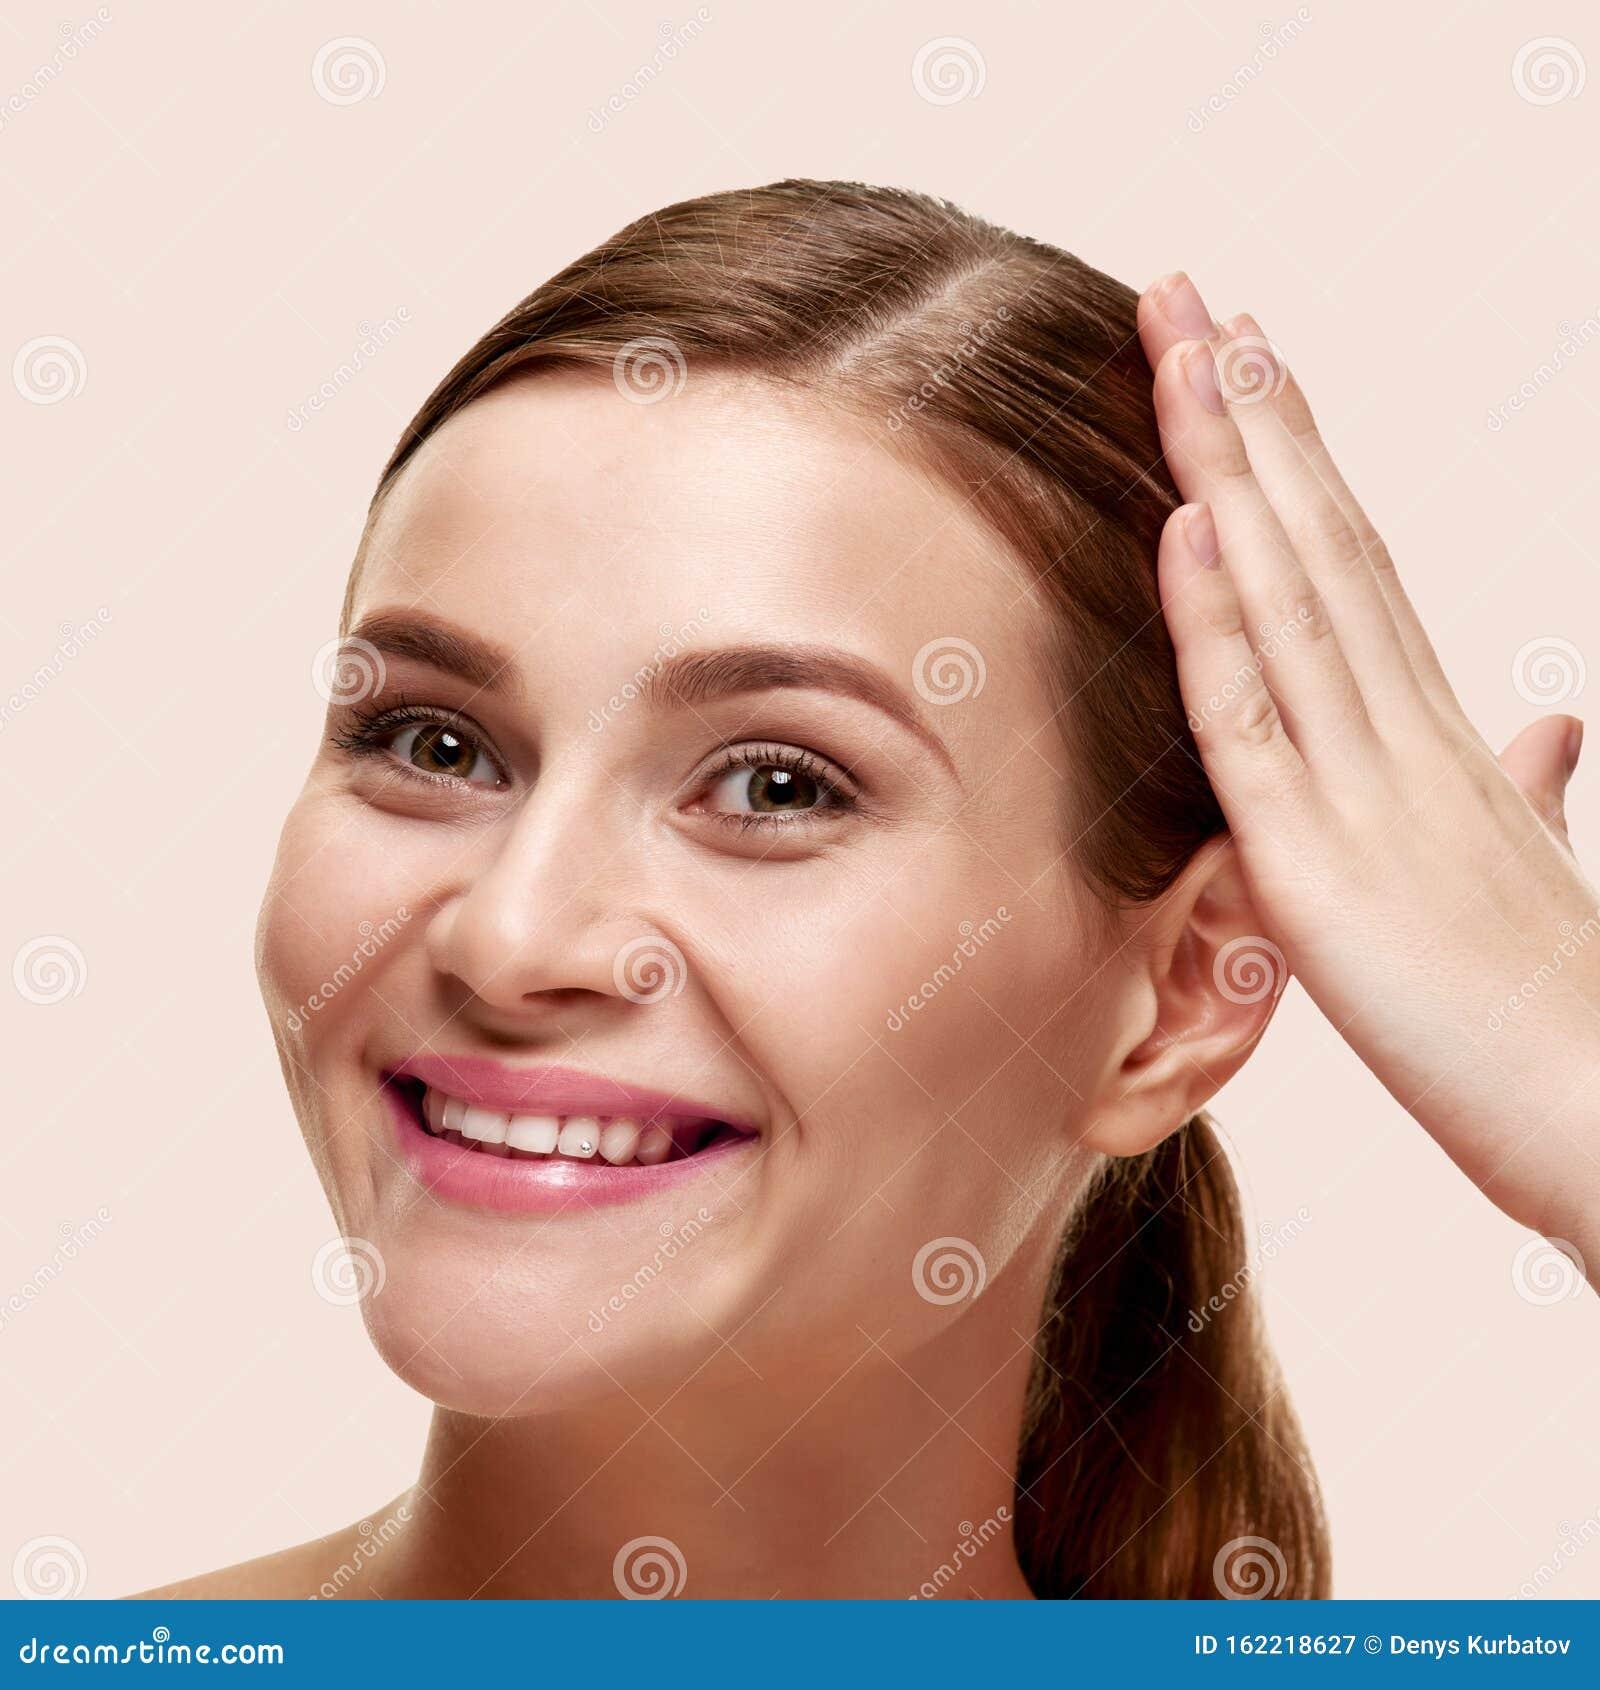 Woman touching hair stock image. Image of fresh, beauty